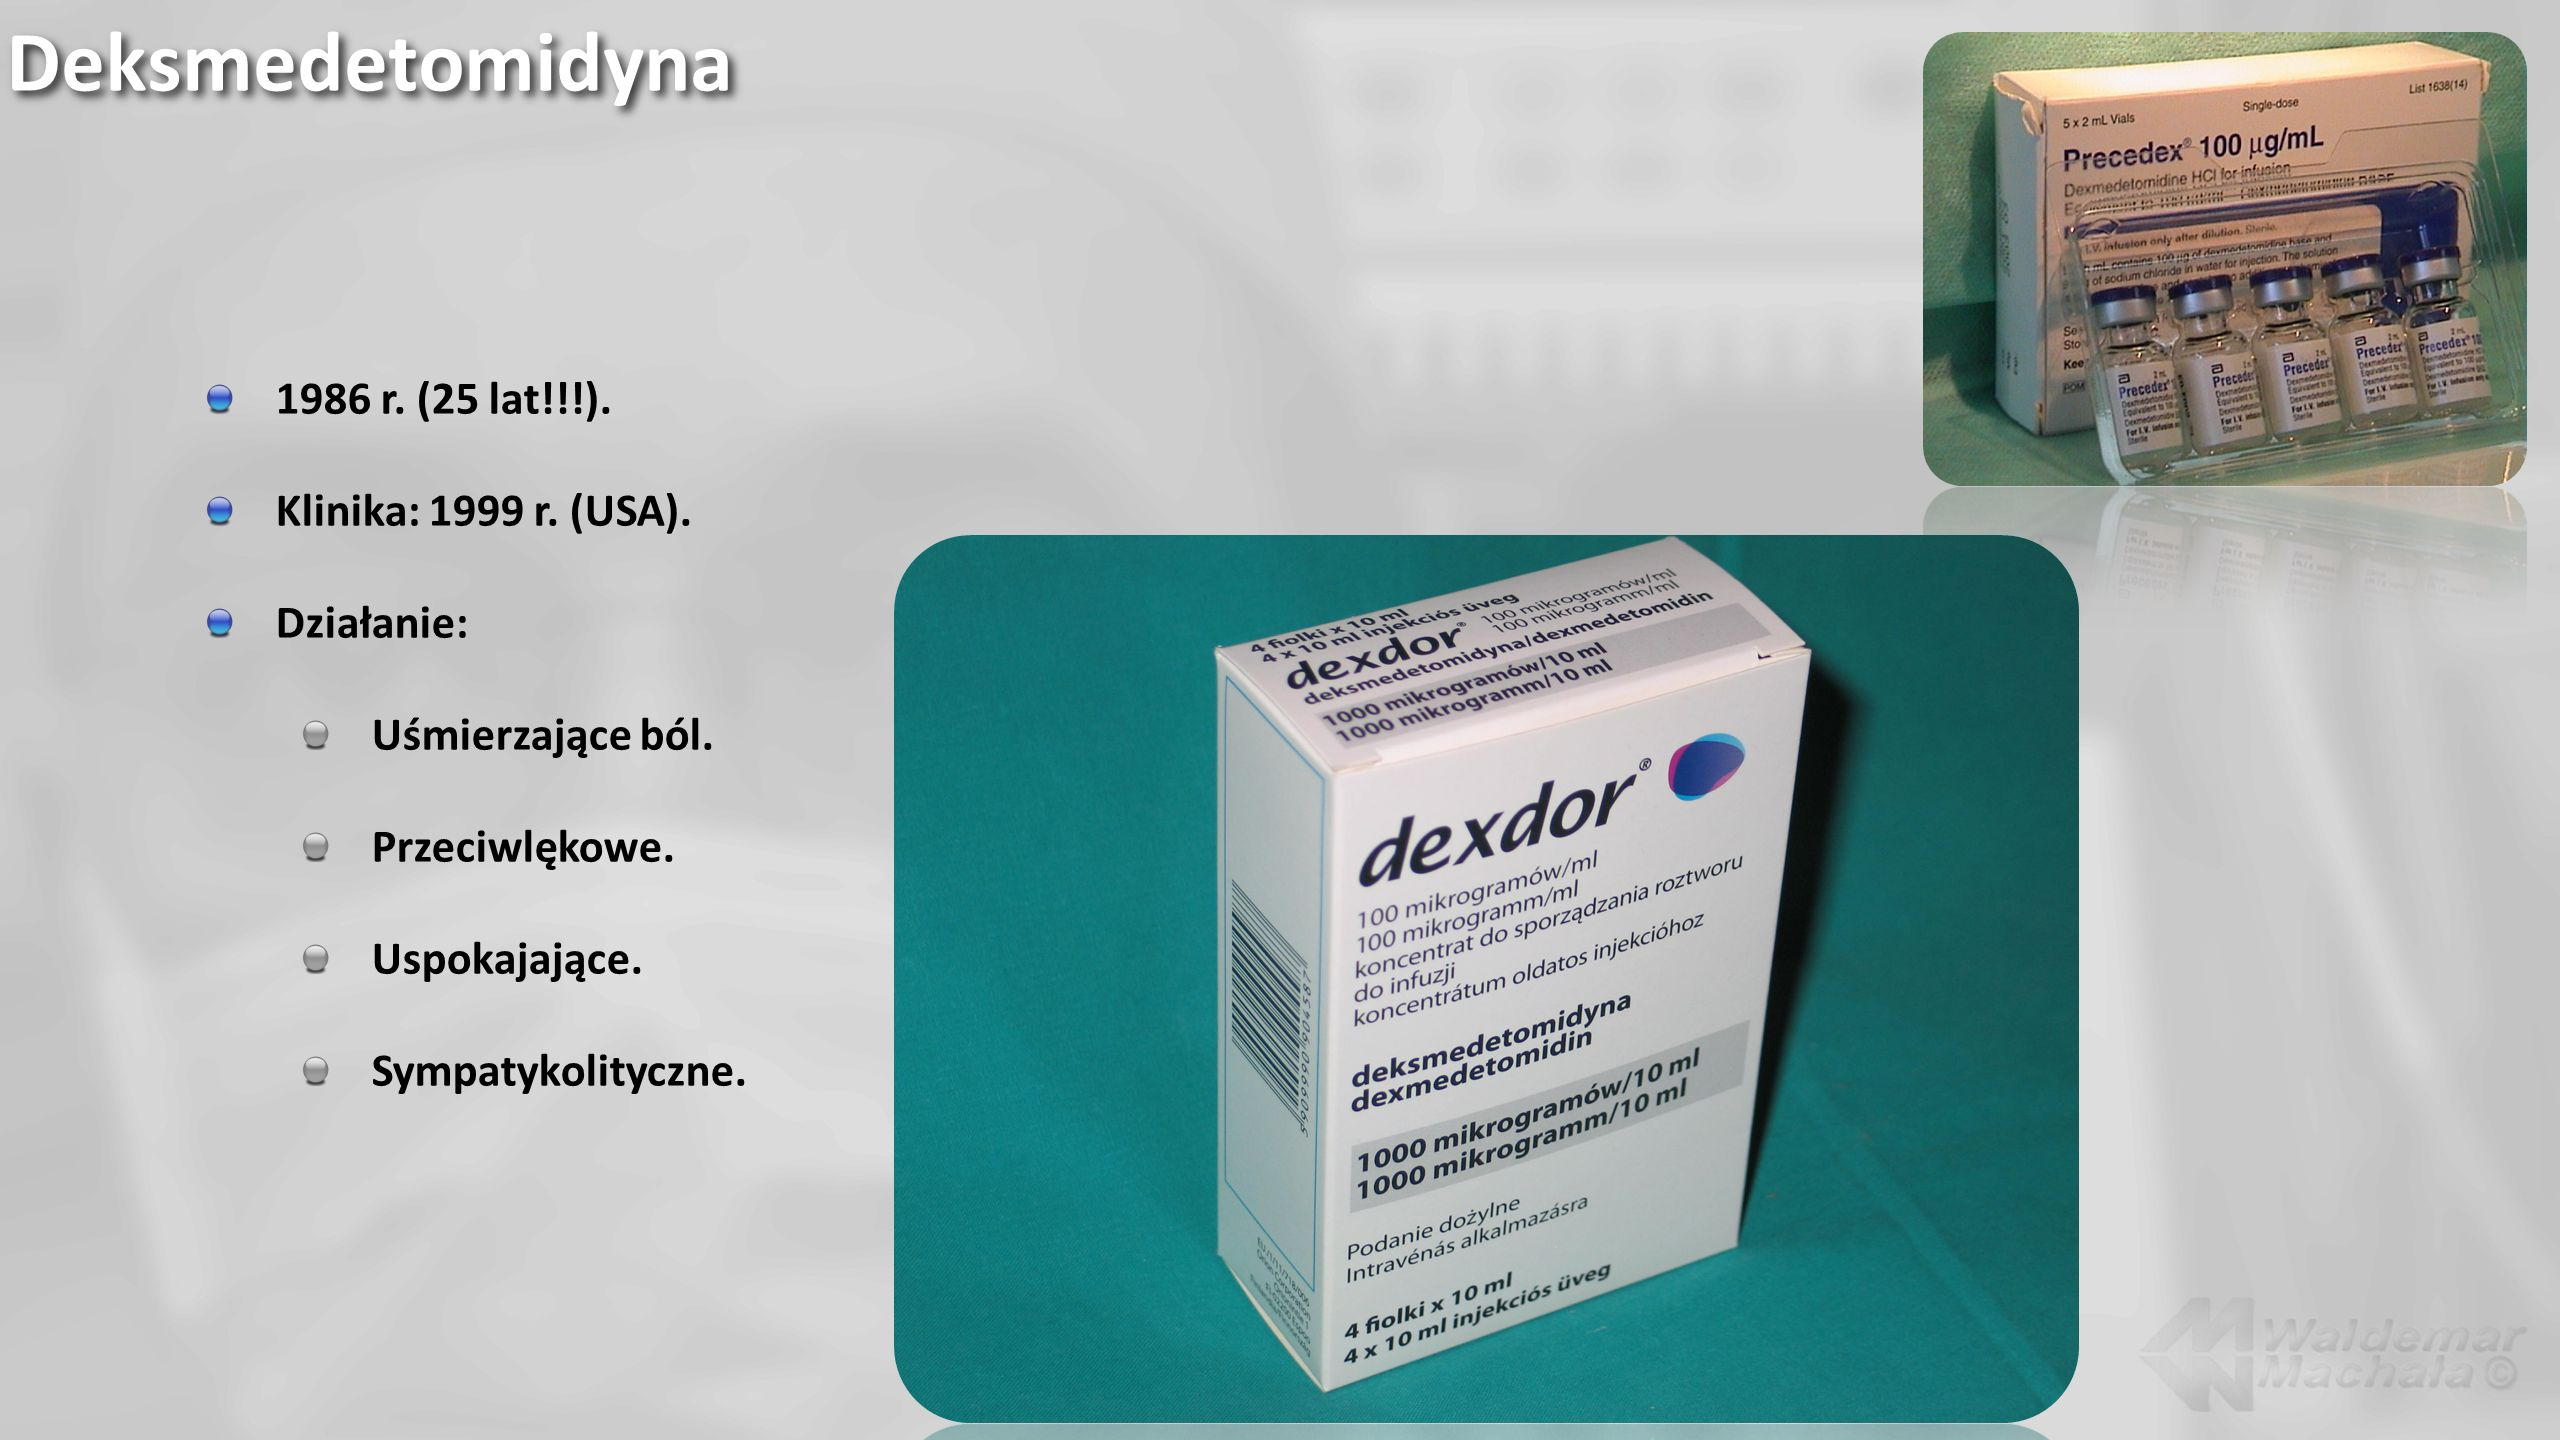 Deksmedetomidyna 1986 r. (25 lat!!!). Klinika: 1999 r. (USA).